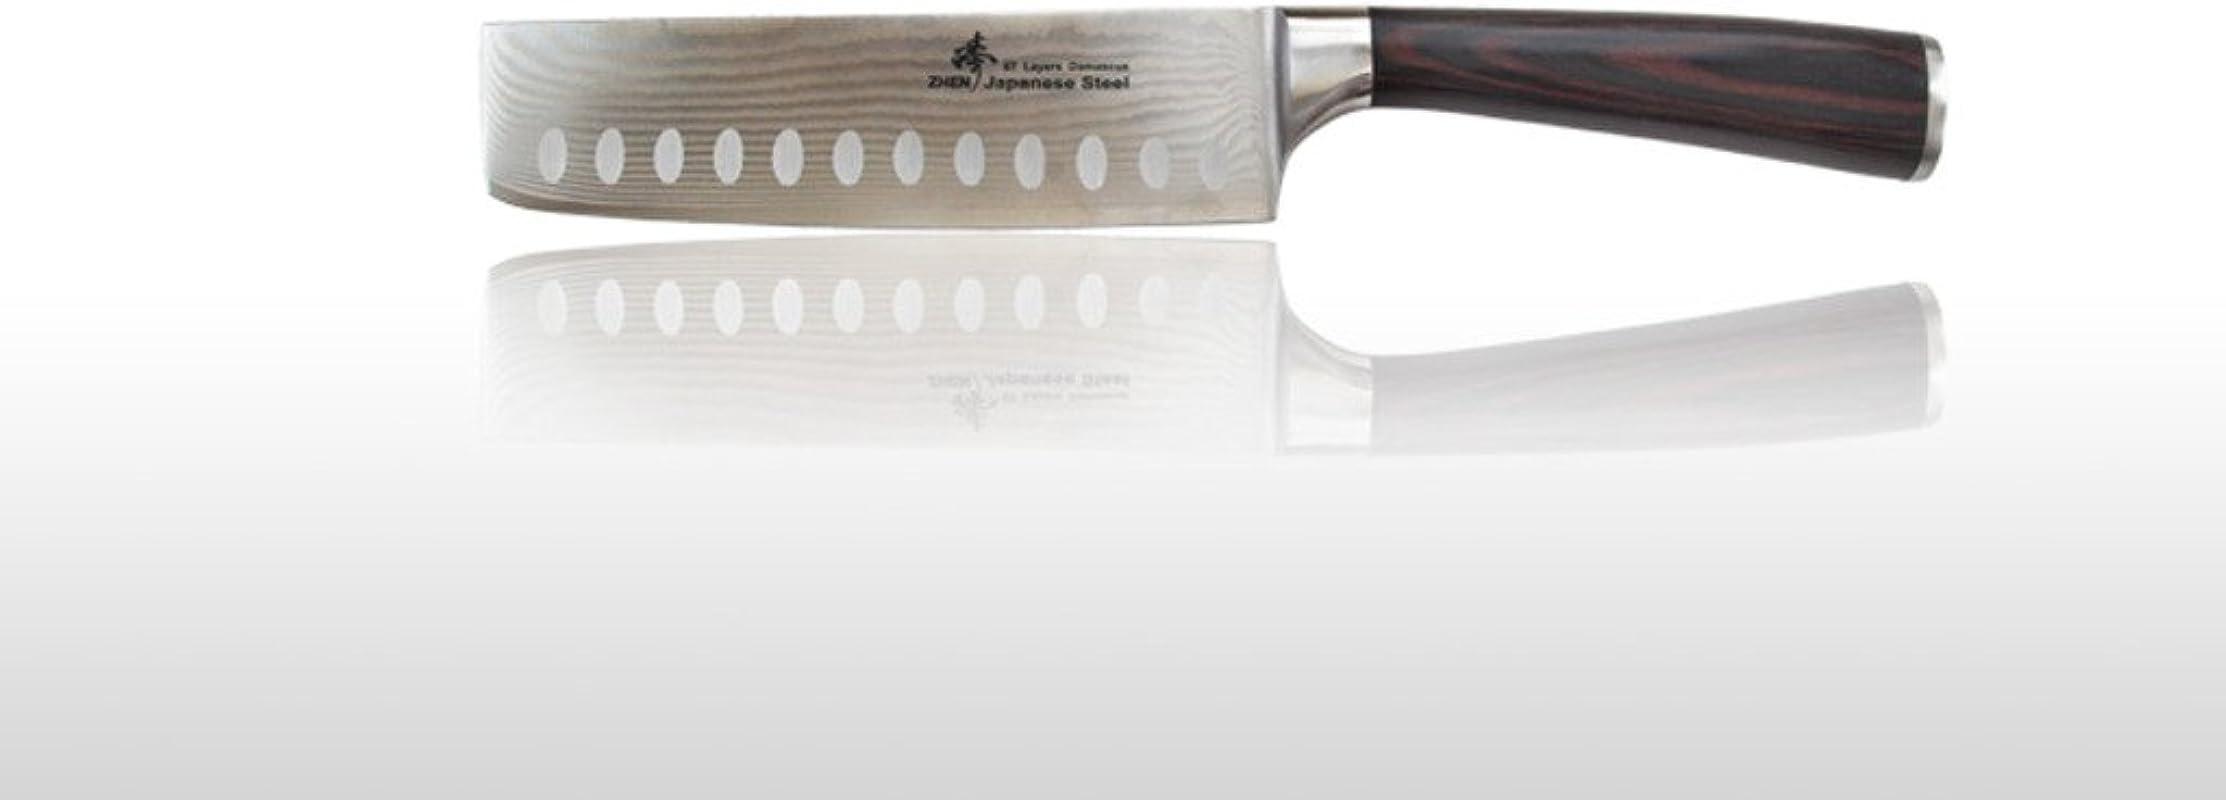 ZHEN Japanese VG 10 67 Layers Damascus Steel Vegetable Usuba Nakiri Hollow Ground Knife Cleaver 7 Inch